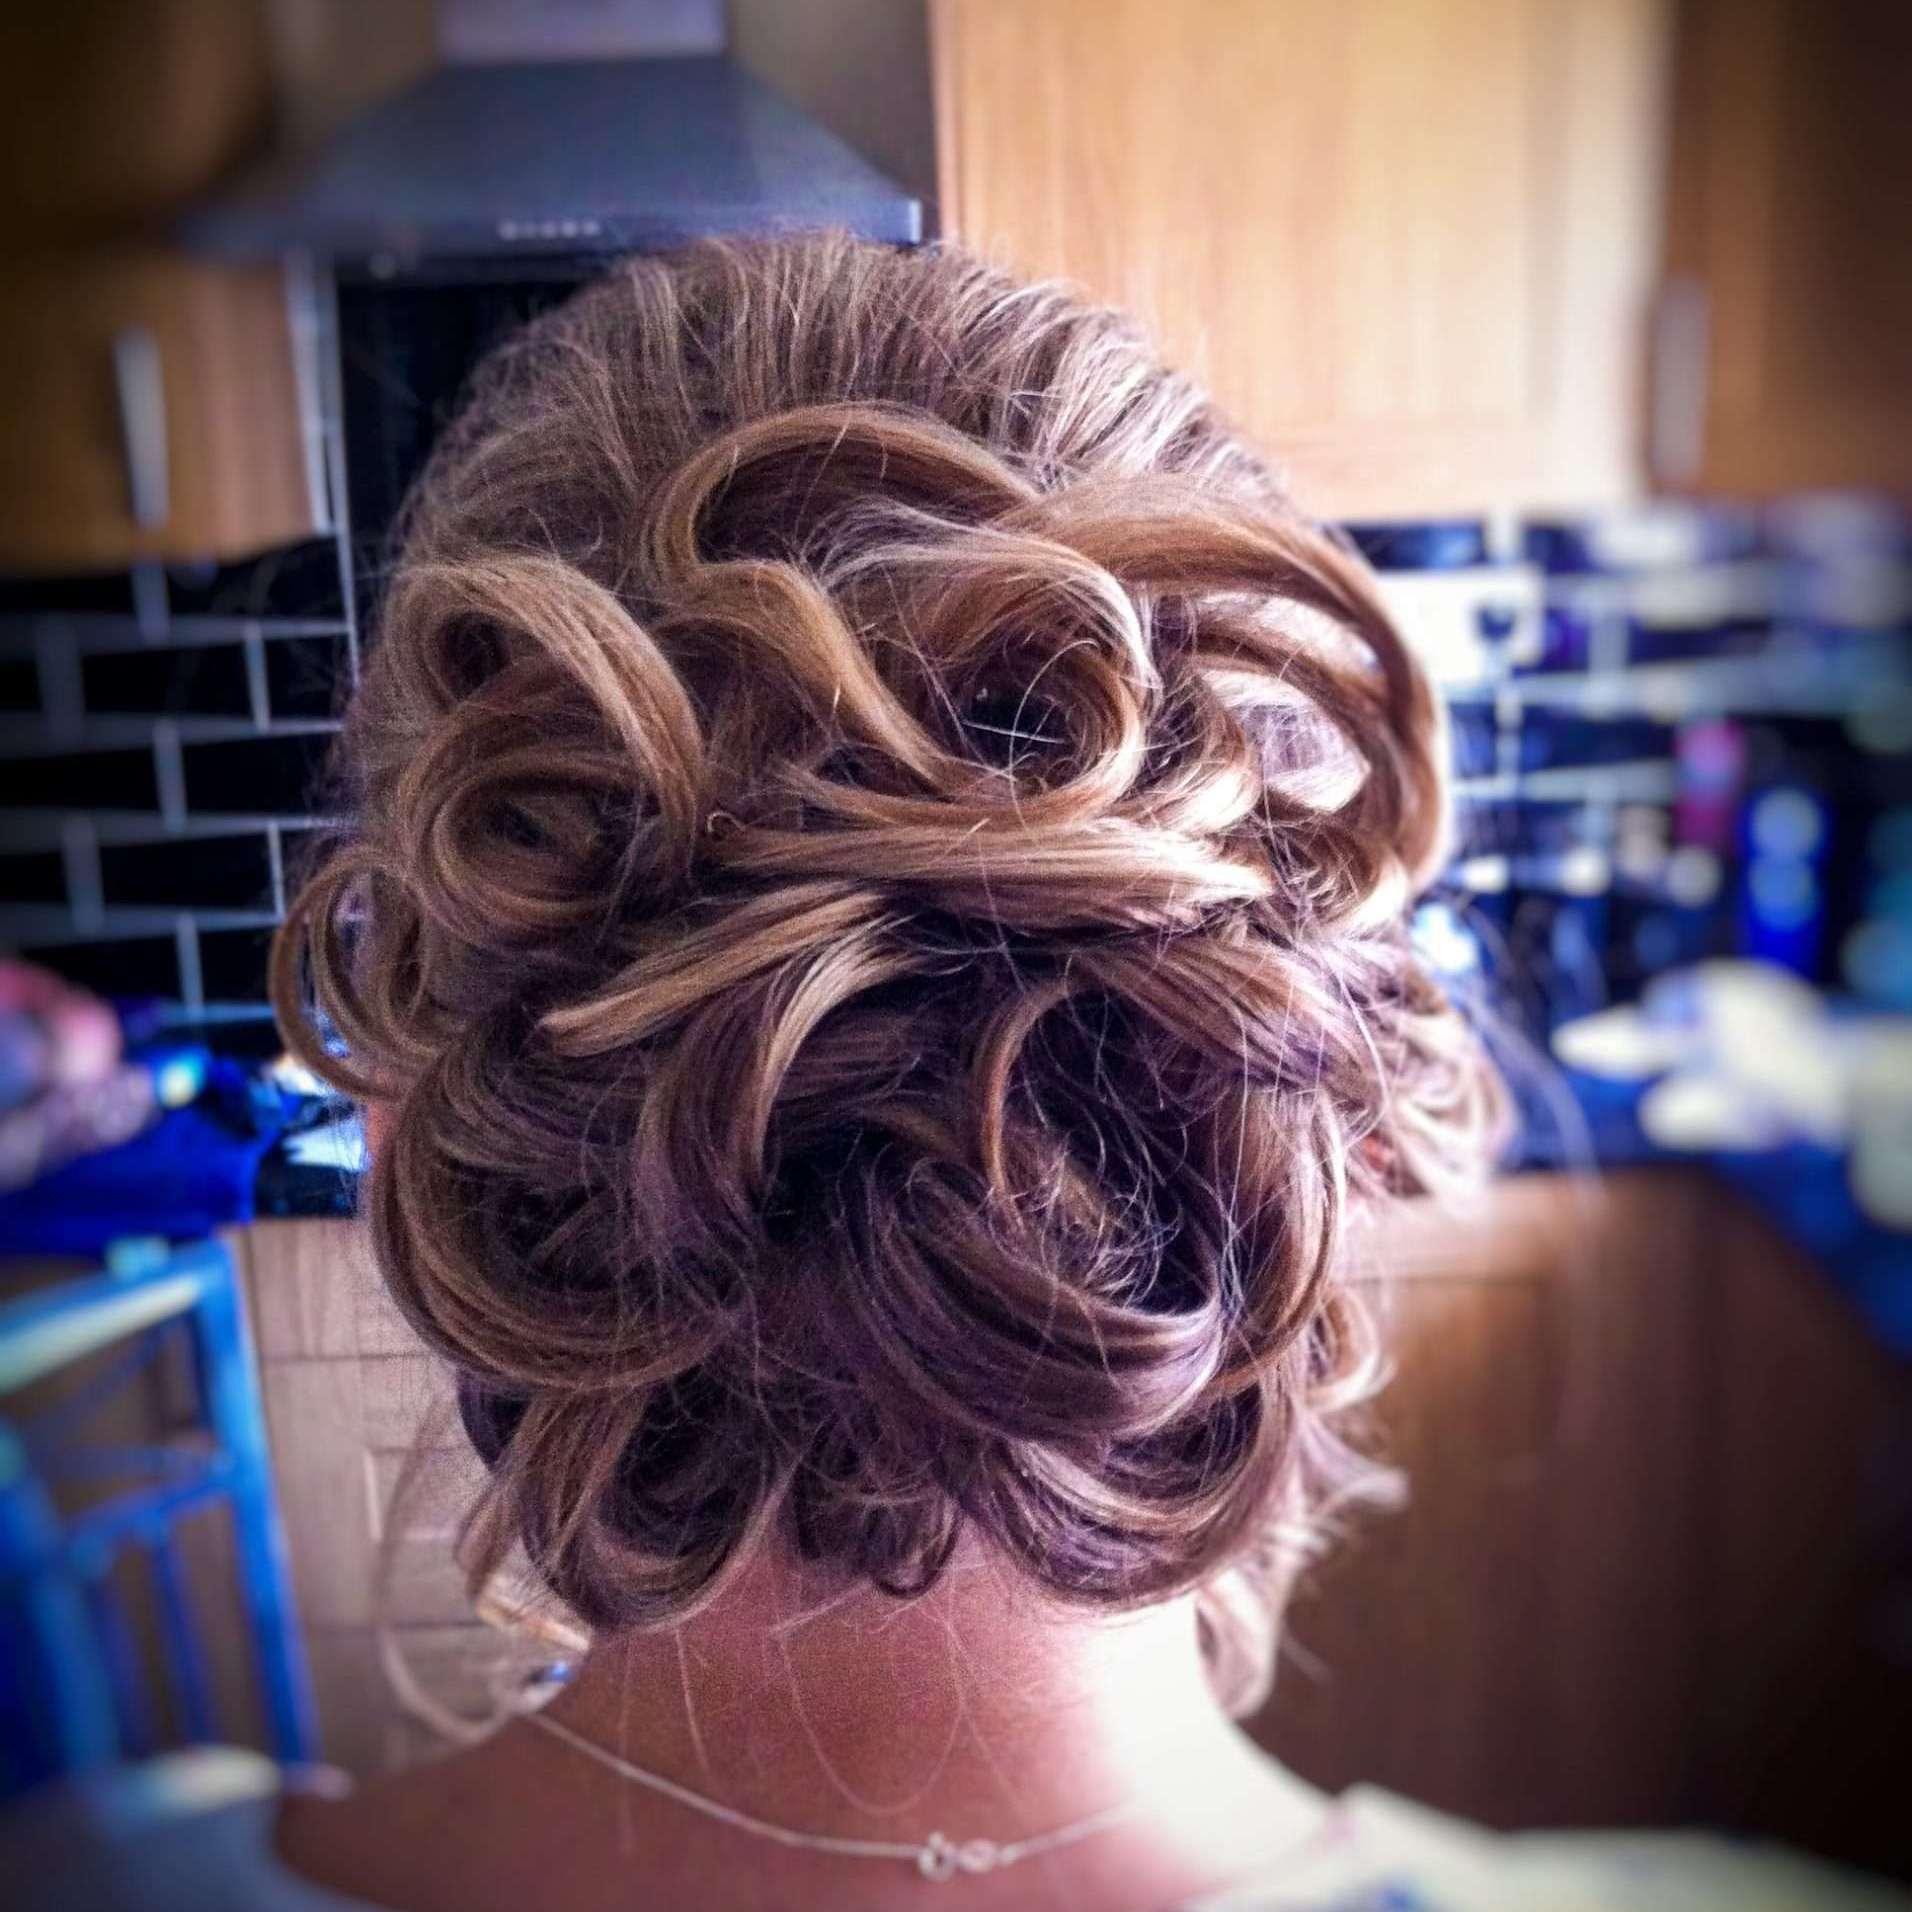 My Wedding Hair. A loose bun made of curls